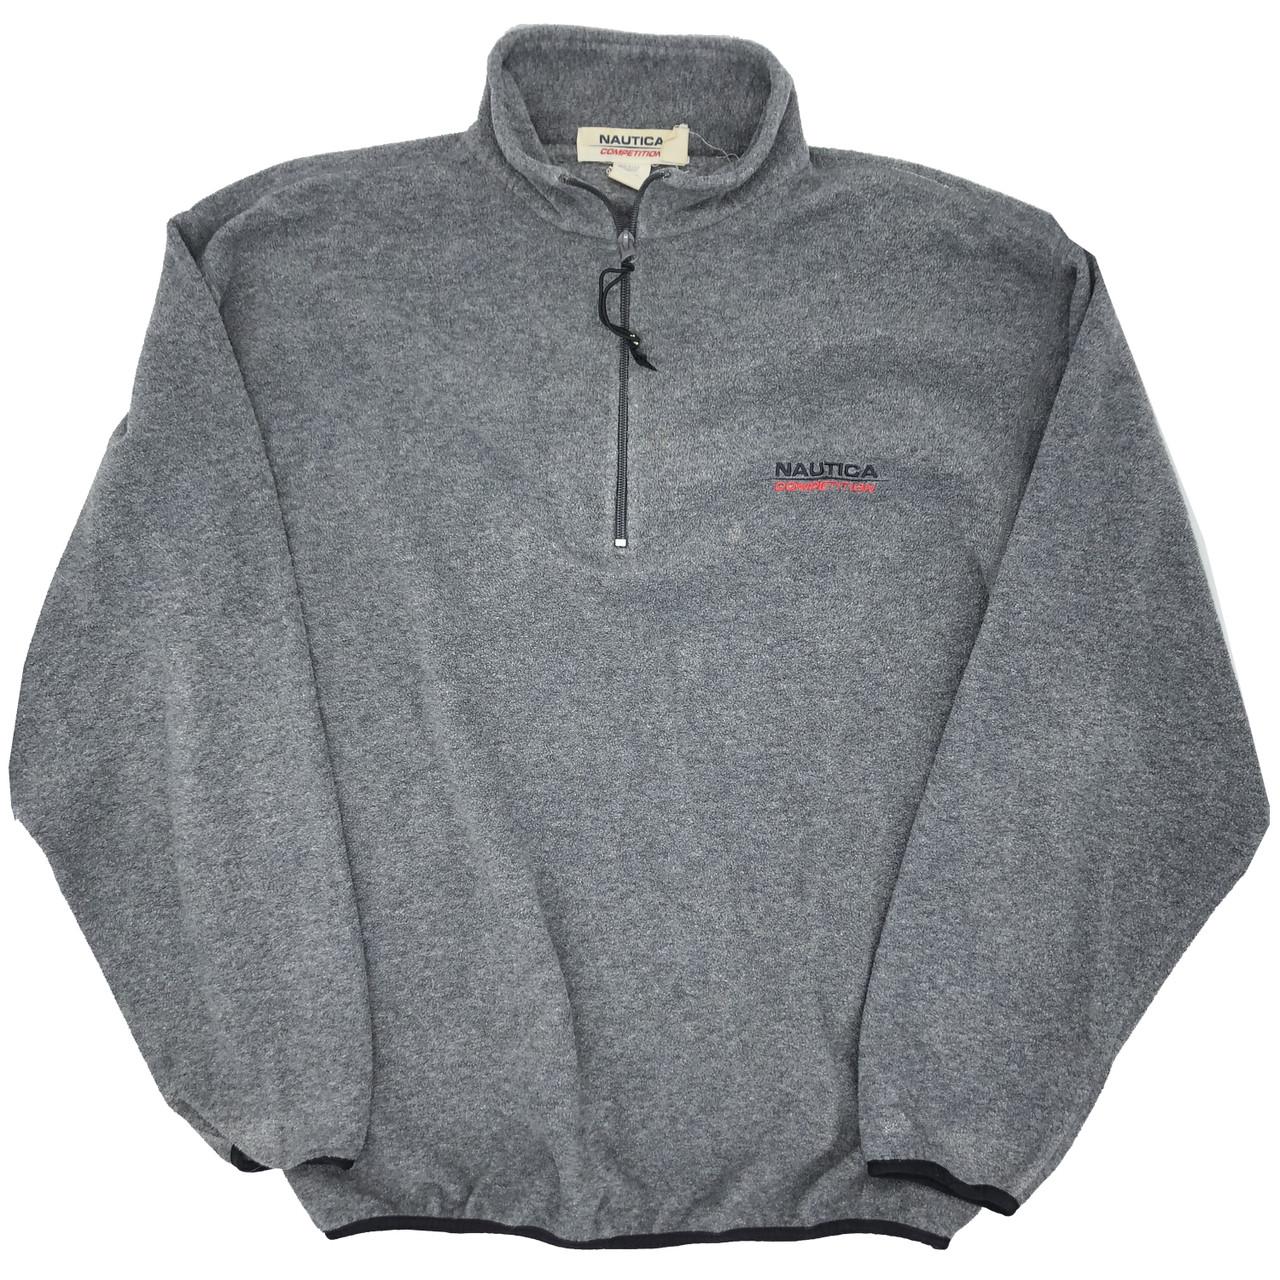 Vtg Nautica fleece sweater